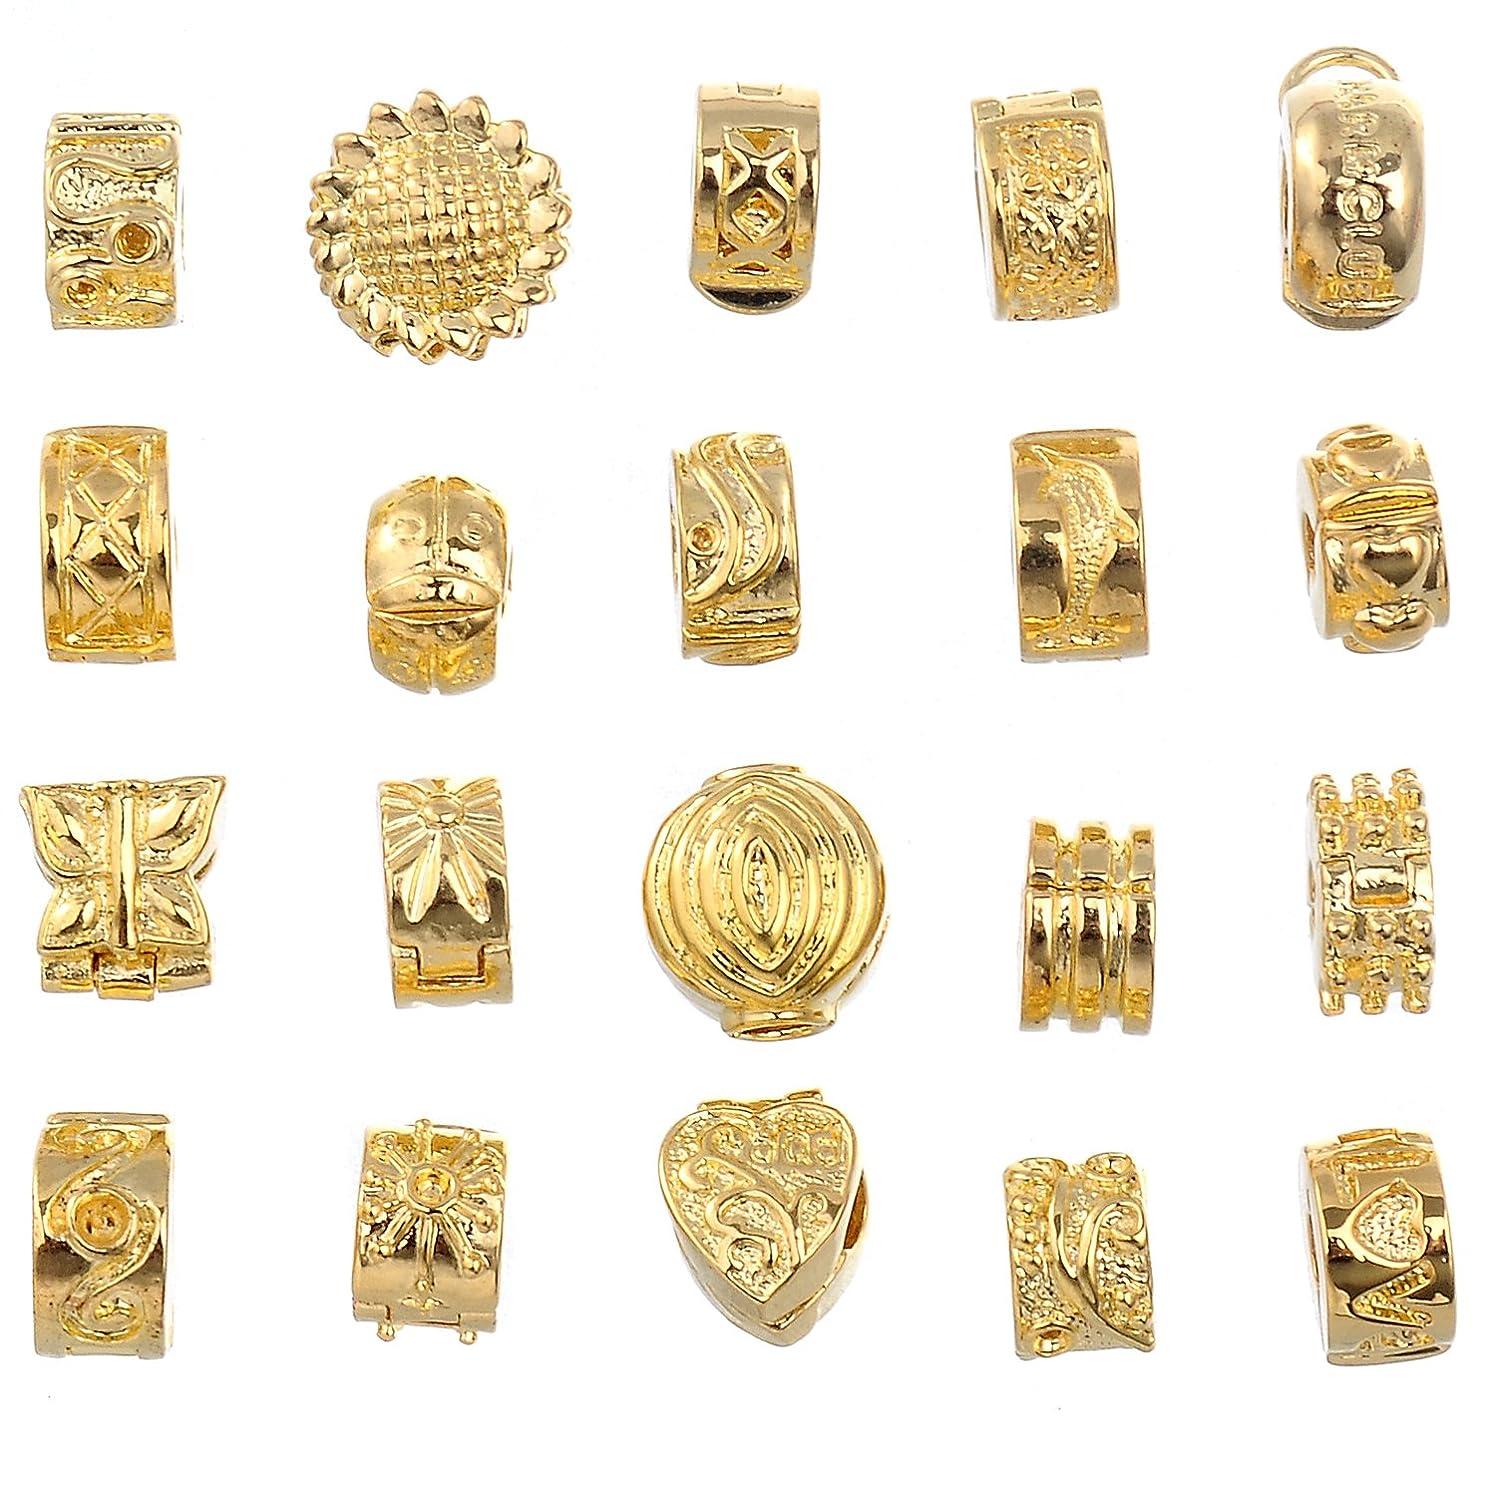 RUBYCA 40pcs Mix Lot of Gold Color Clip Lock Stopper Clasp Beads DIY fit European Charm Bracelet